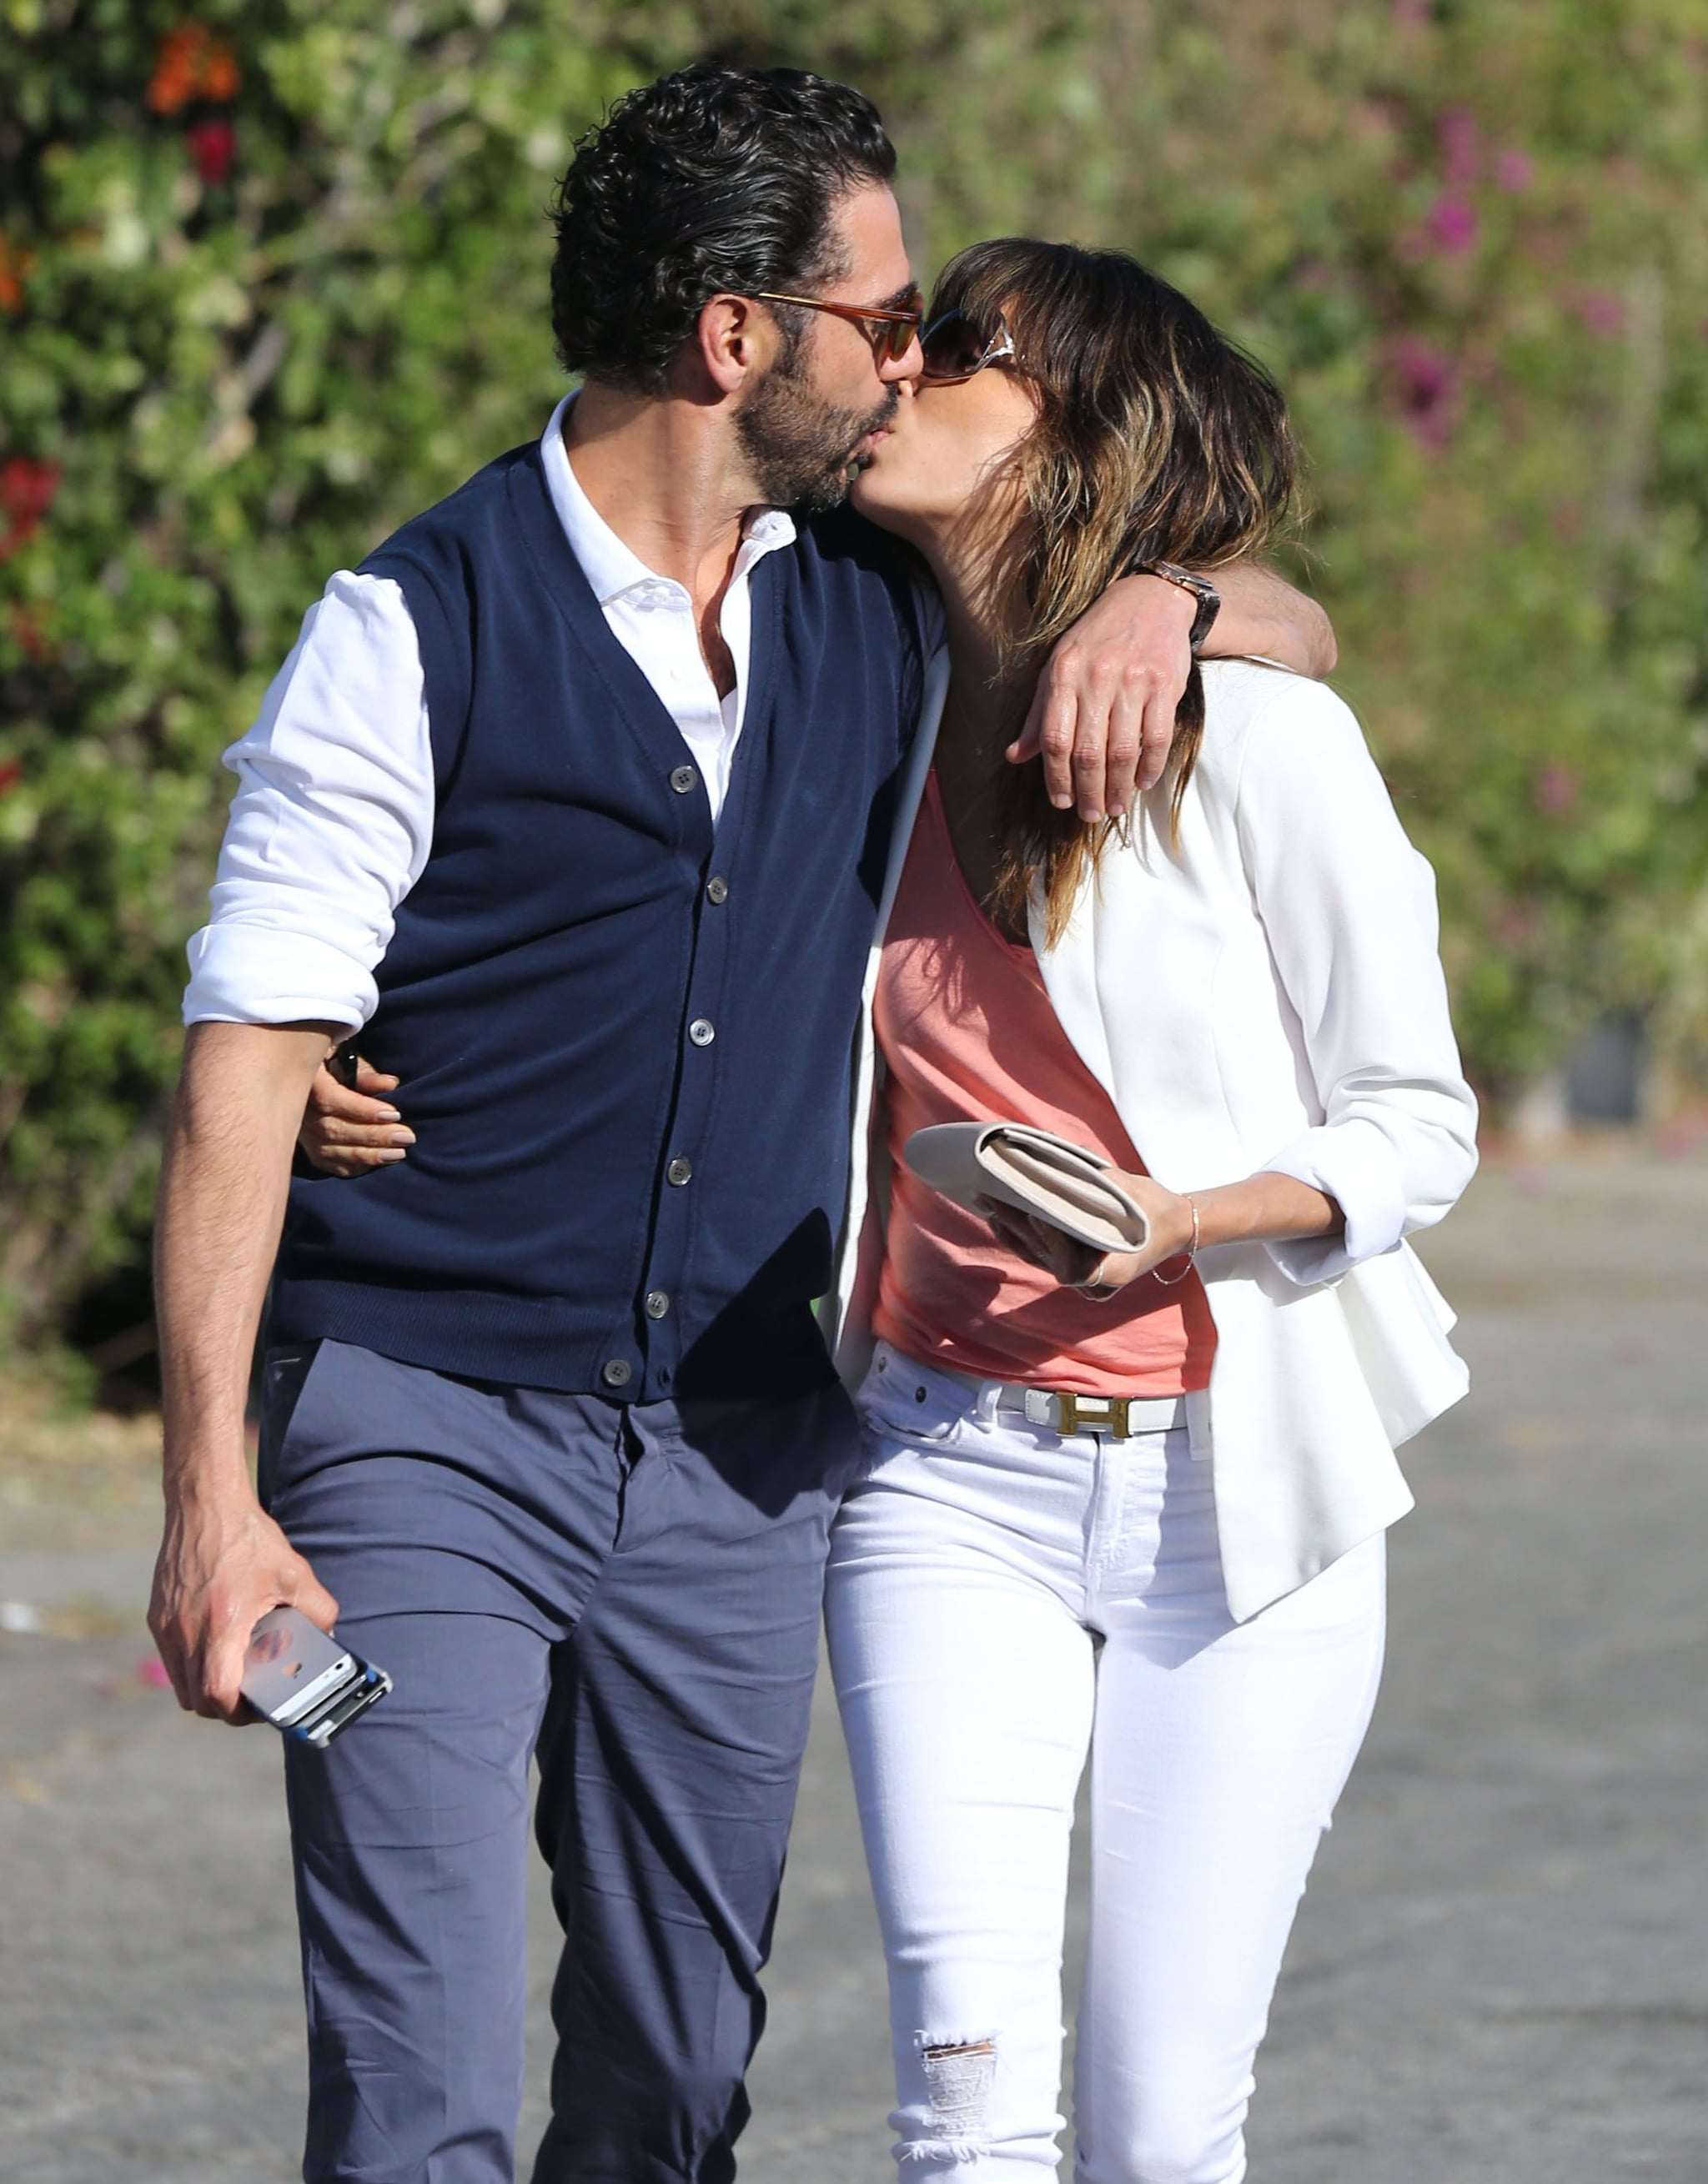 Eva Longoria and her boyfriend, Jose Baston, packed on the PDA in LA.